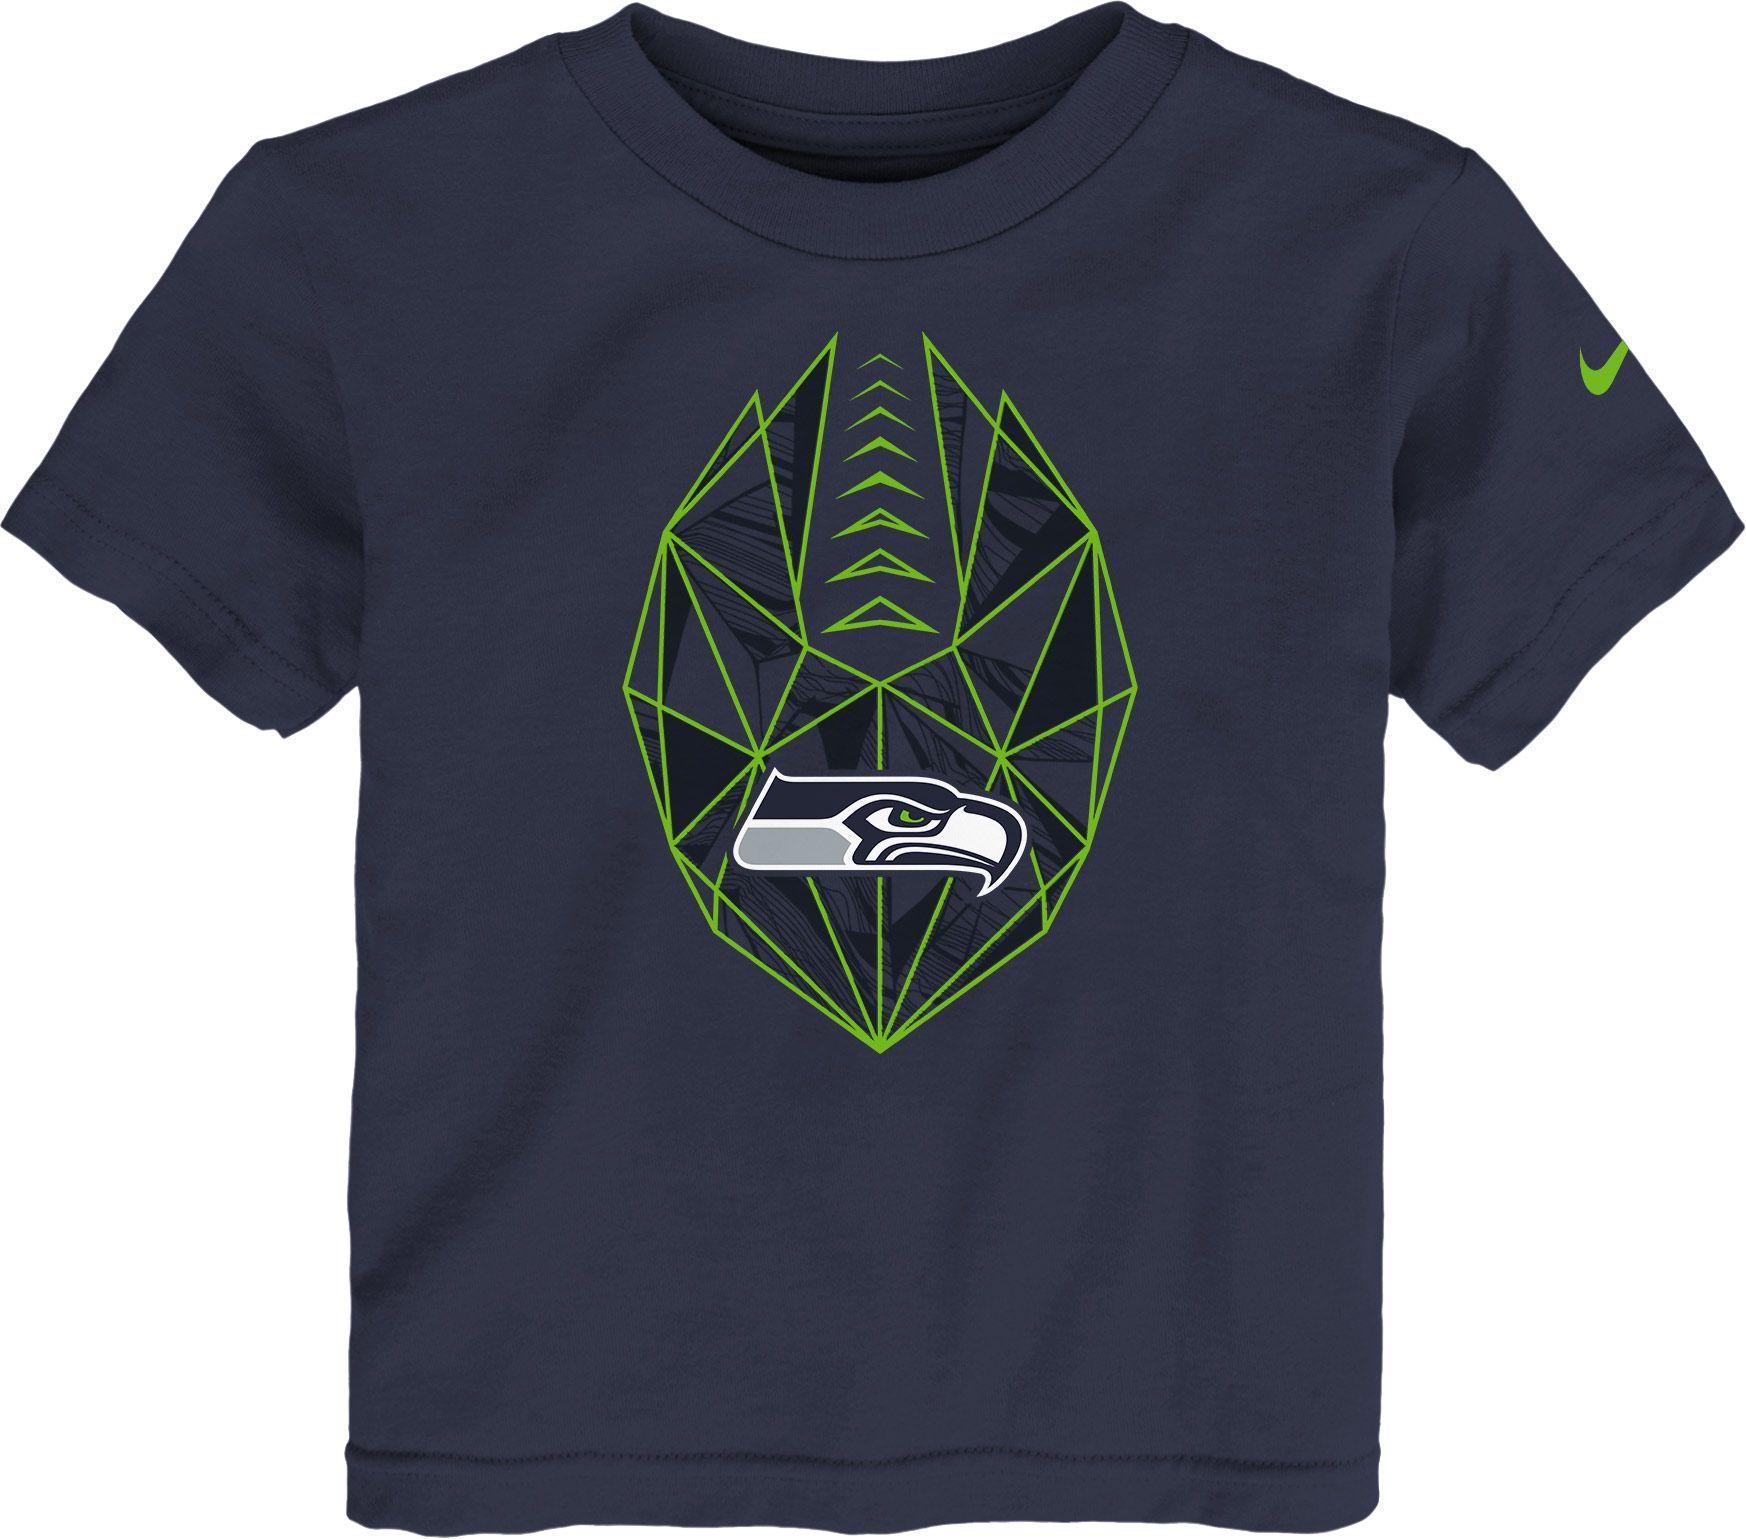 Nike Boys' Seattle Football Icon Navy TShirt, Blue in